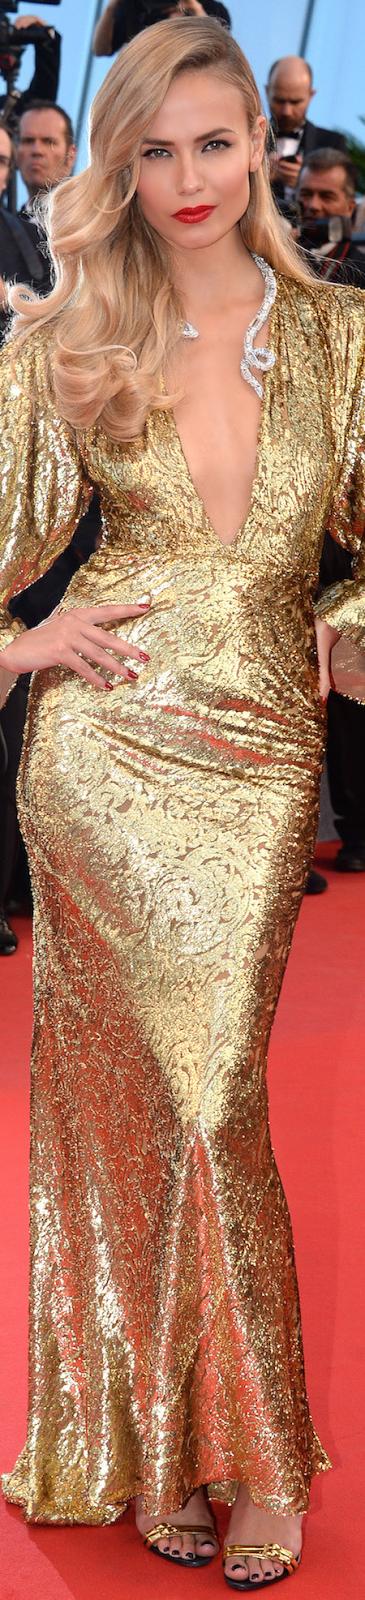 Natasha Poly Cannes Flim Festival 2015